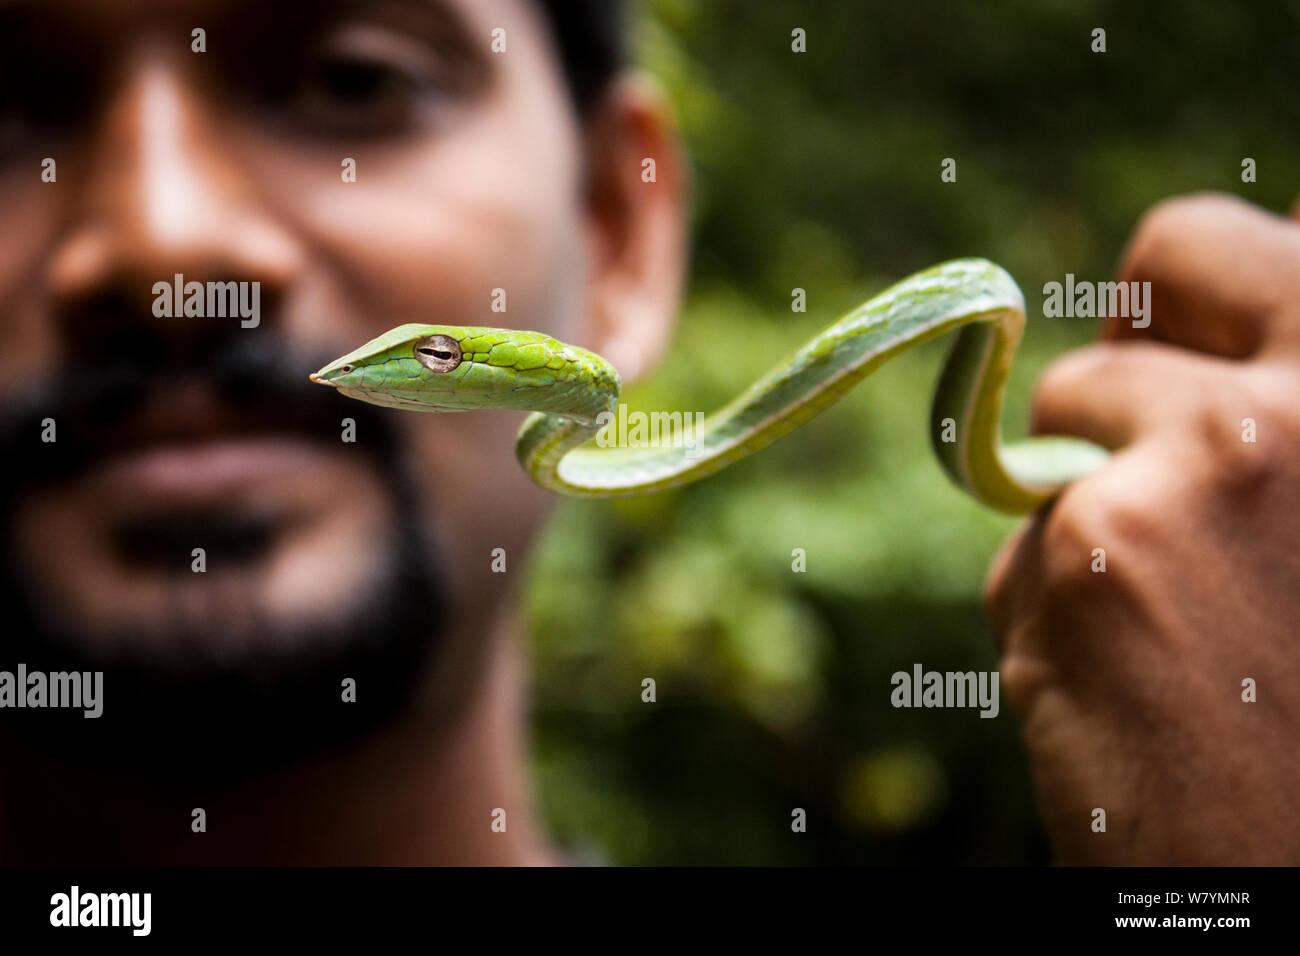 Man holding juvenile vine snake (Ahaetulla nasuta), Agumbe, Thirthahalli taluk, Malnad, Karnataka, en Inde, en juillet. Banque D'Images